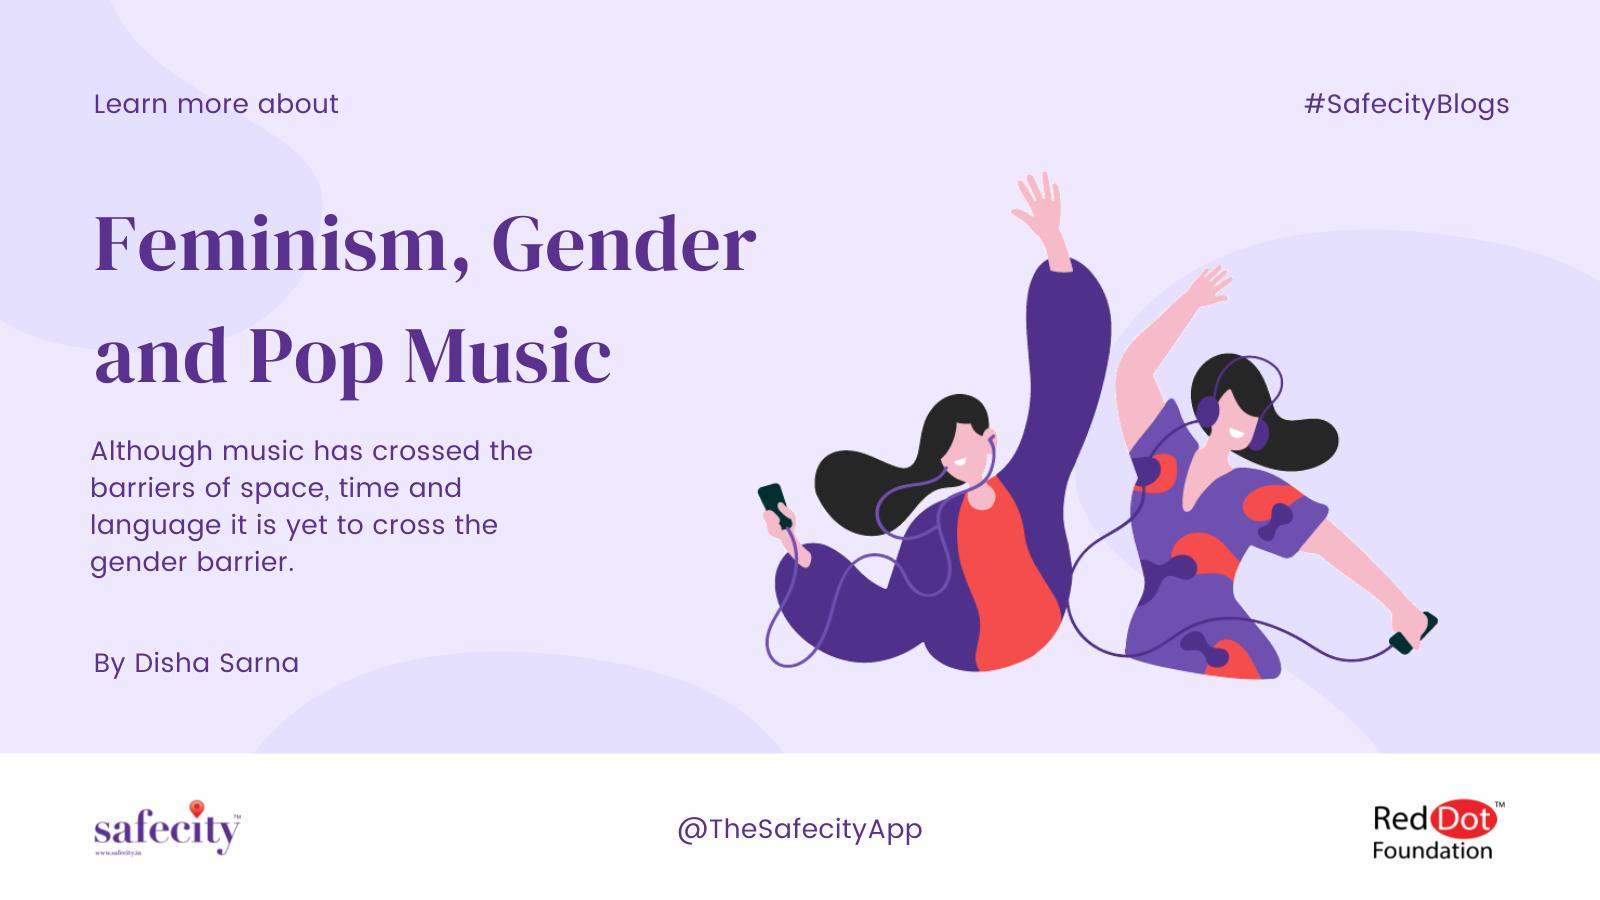 Blog on Feminism, Gender and Pop Music